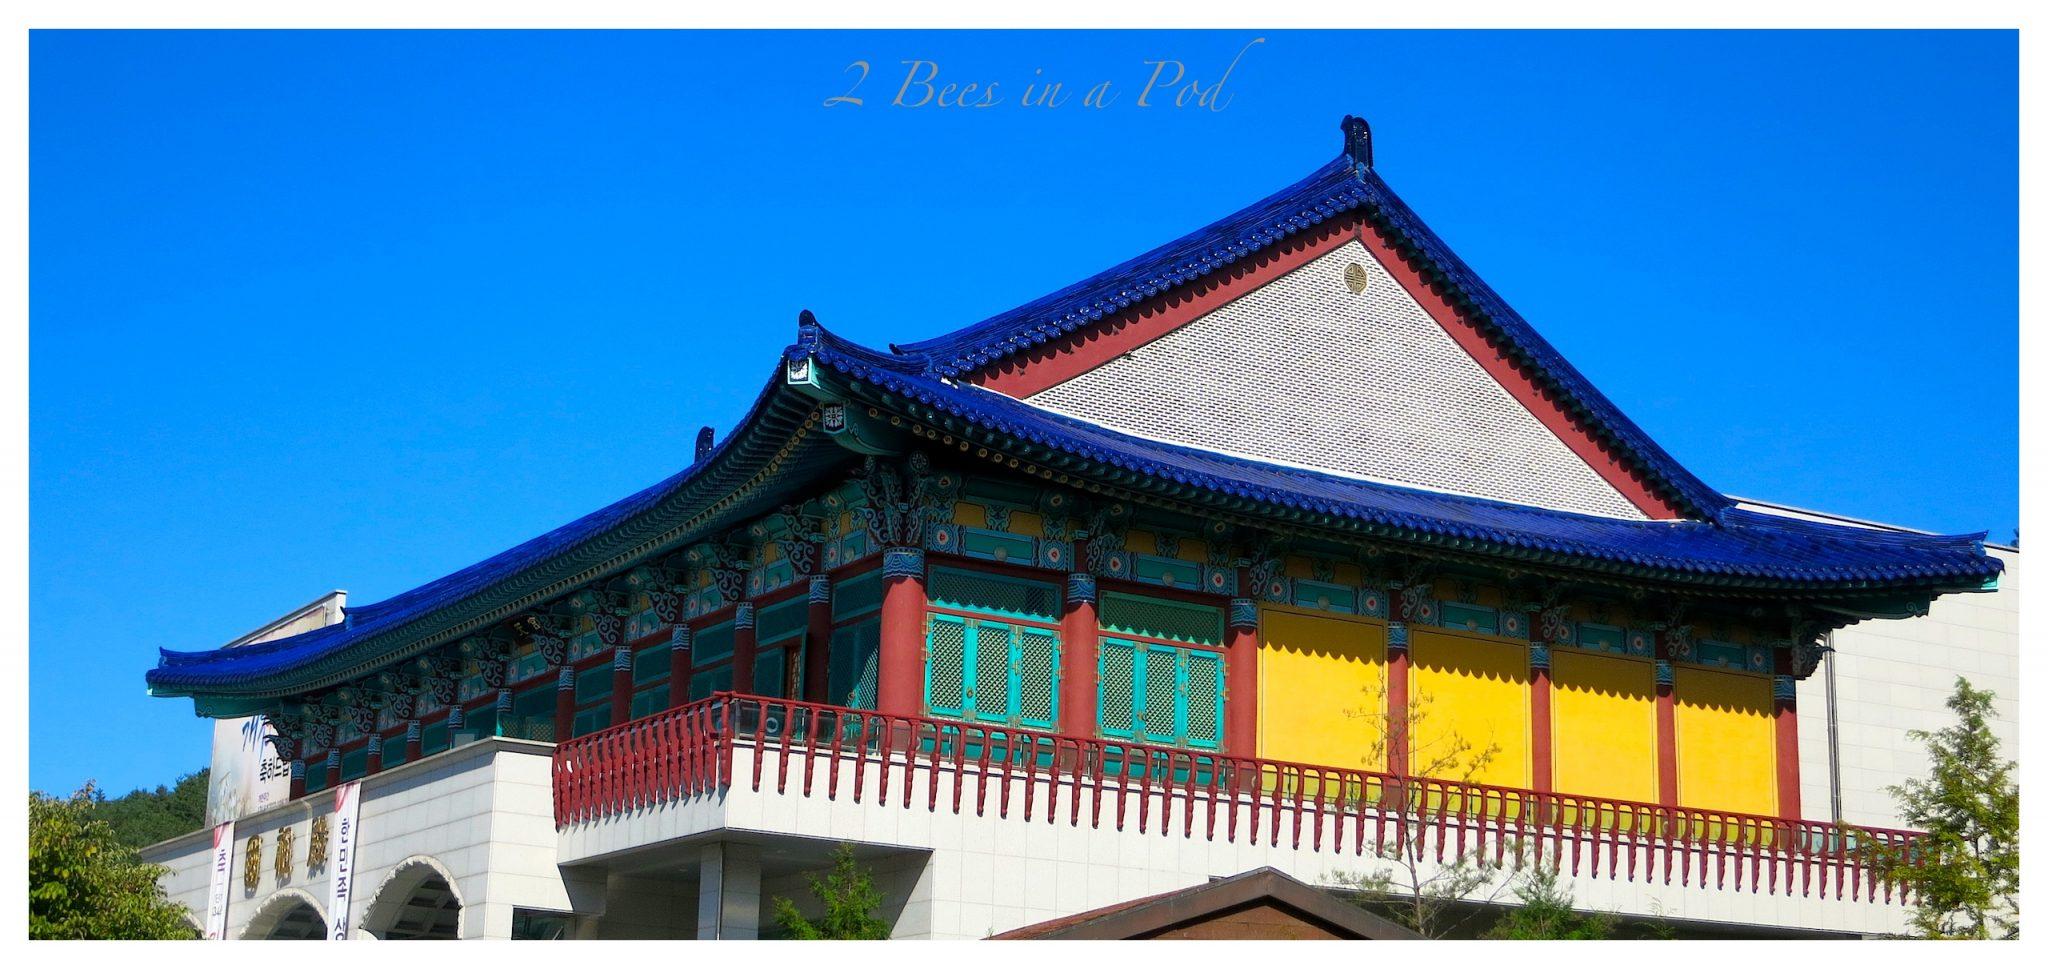 A beautiful temple in Cheonan, South Korea